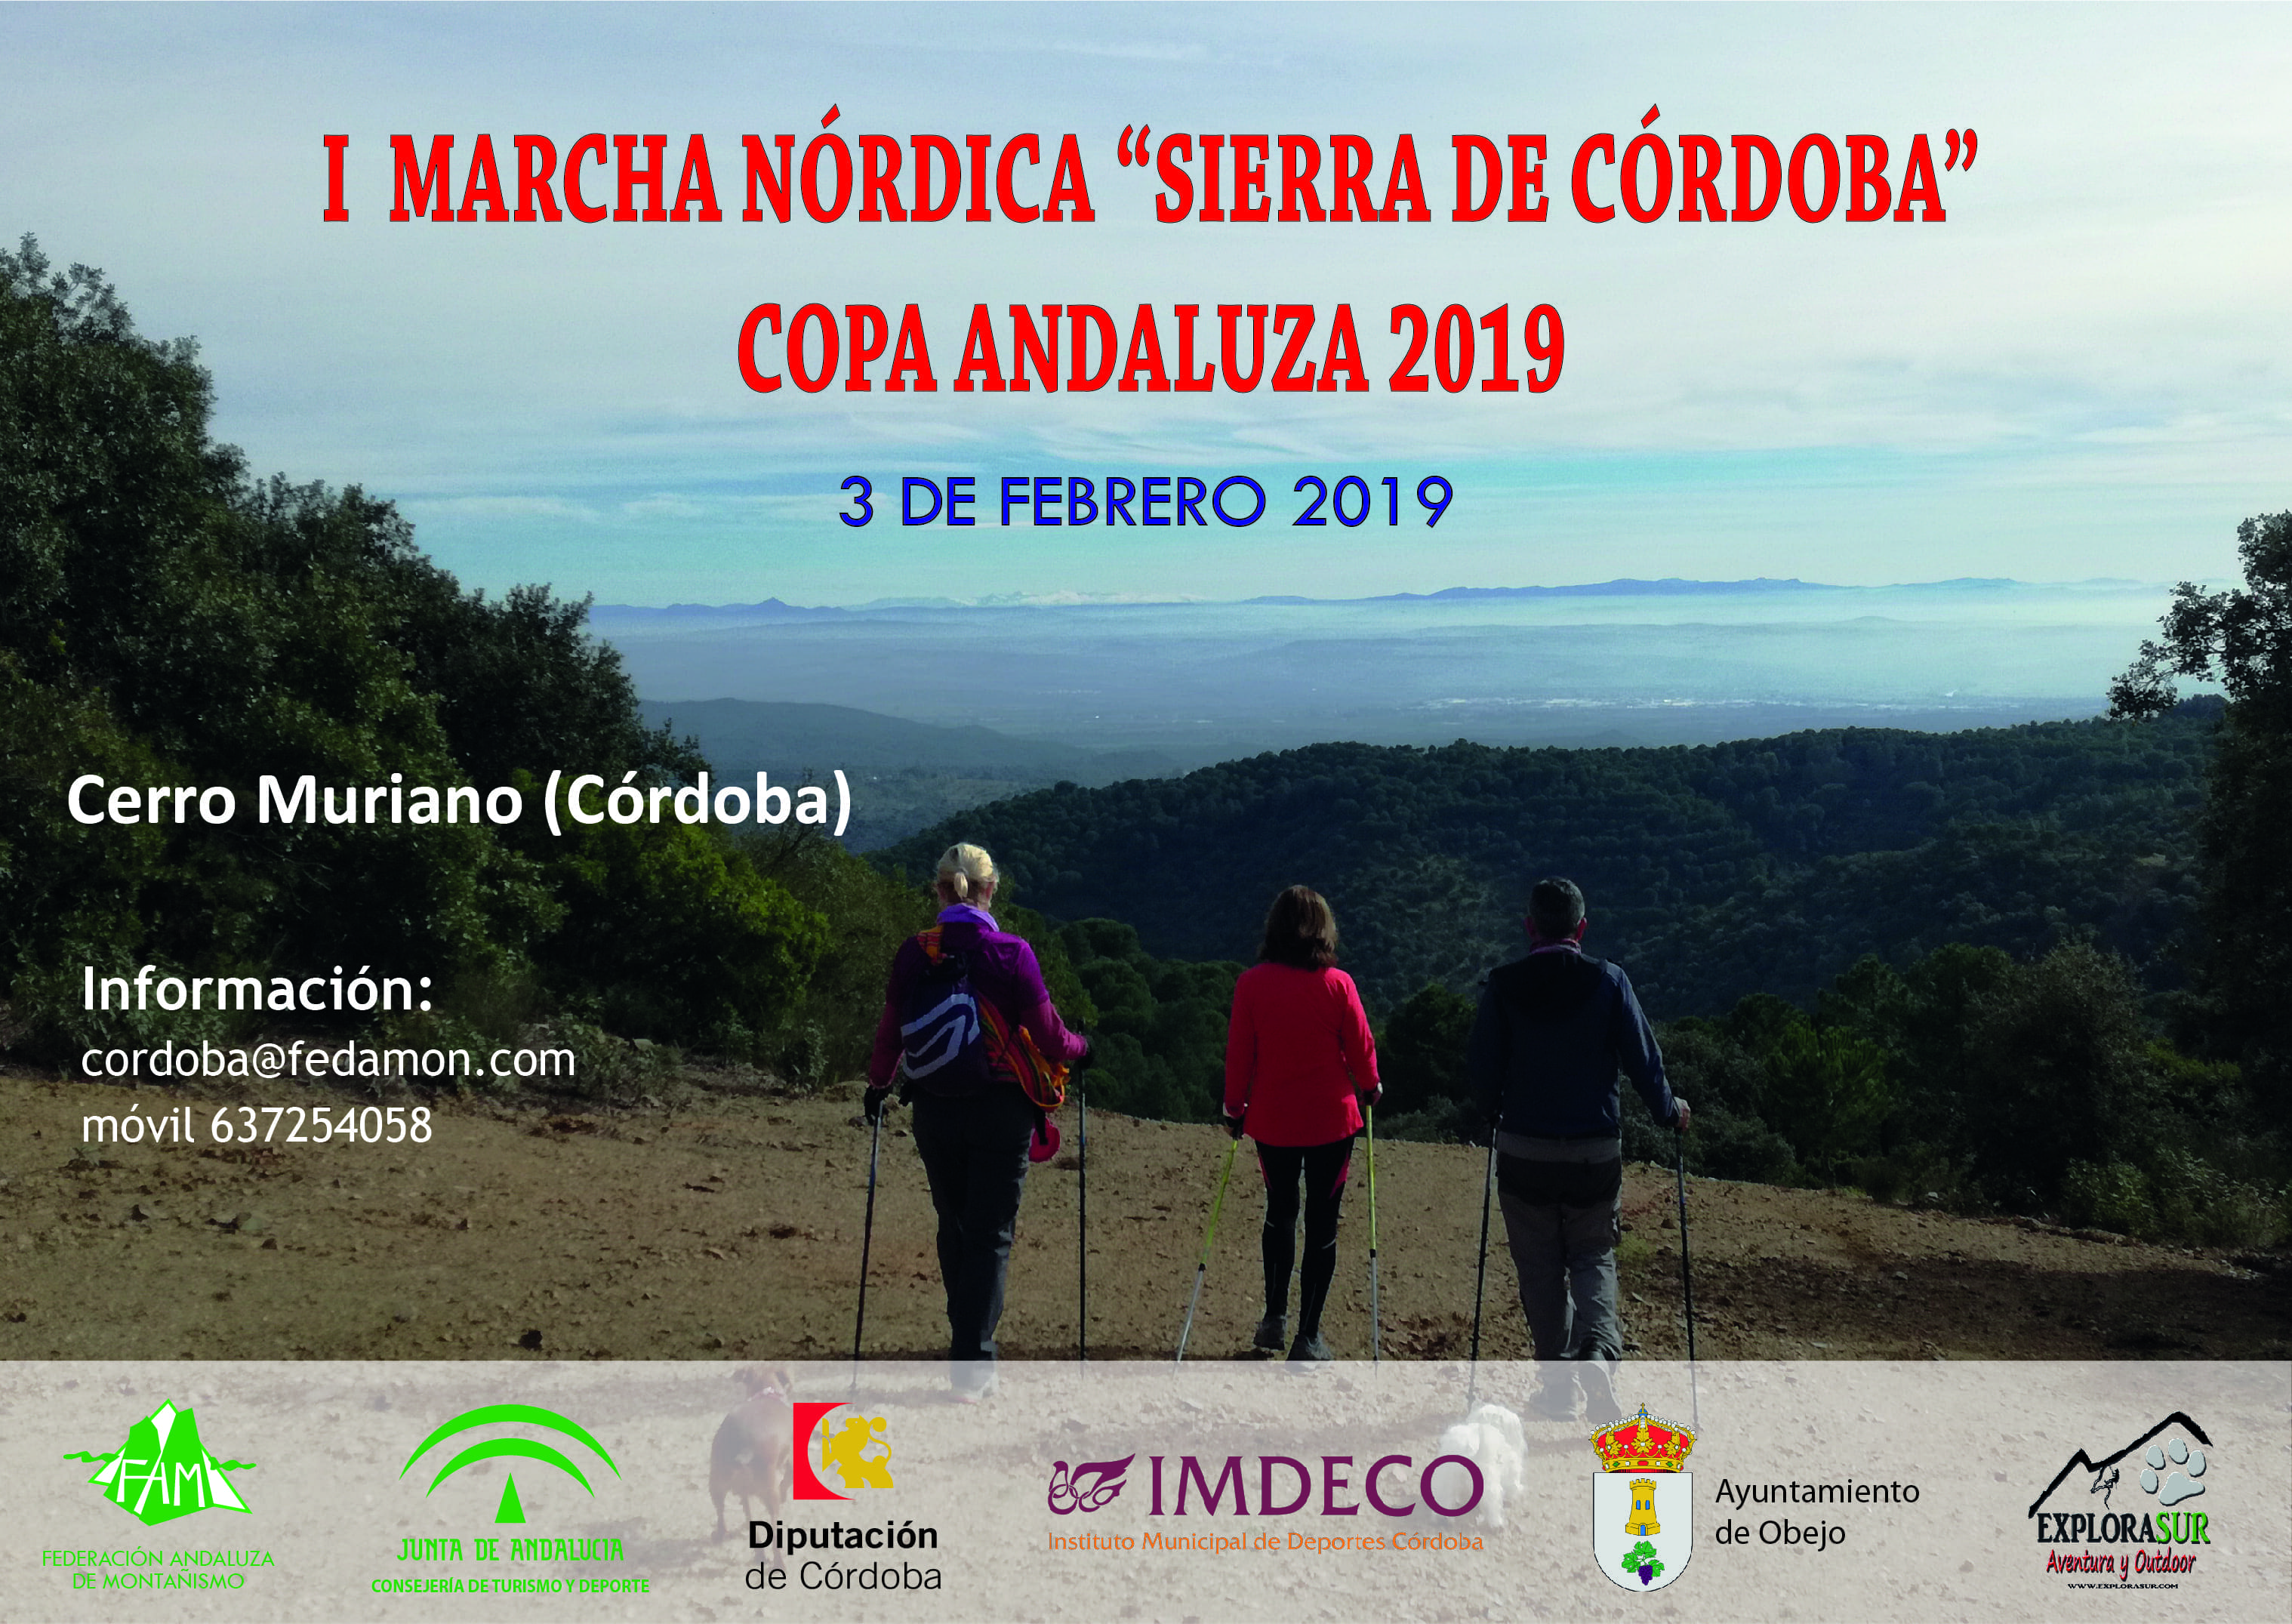 I Marcha Nórdica 'Sierra de Córdoba'  COPA ANDALUZA 2019 - Sprint Chip